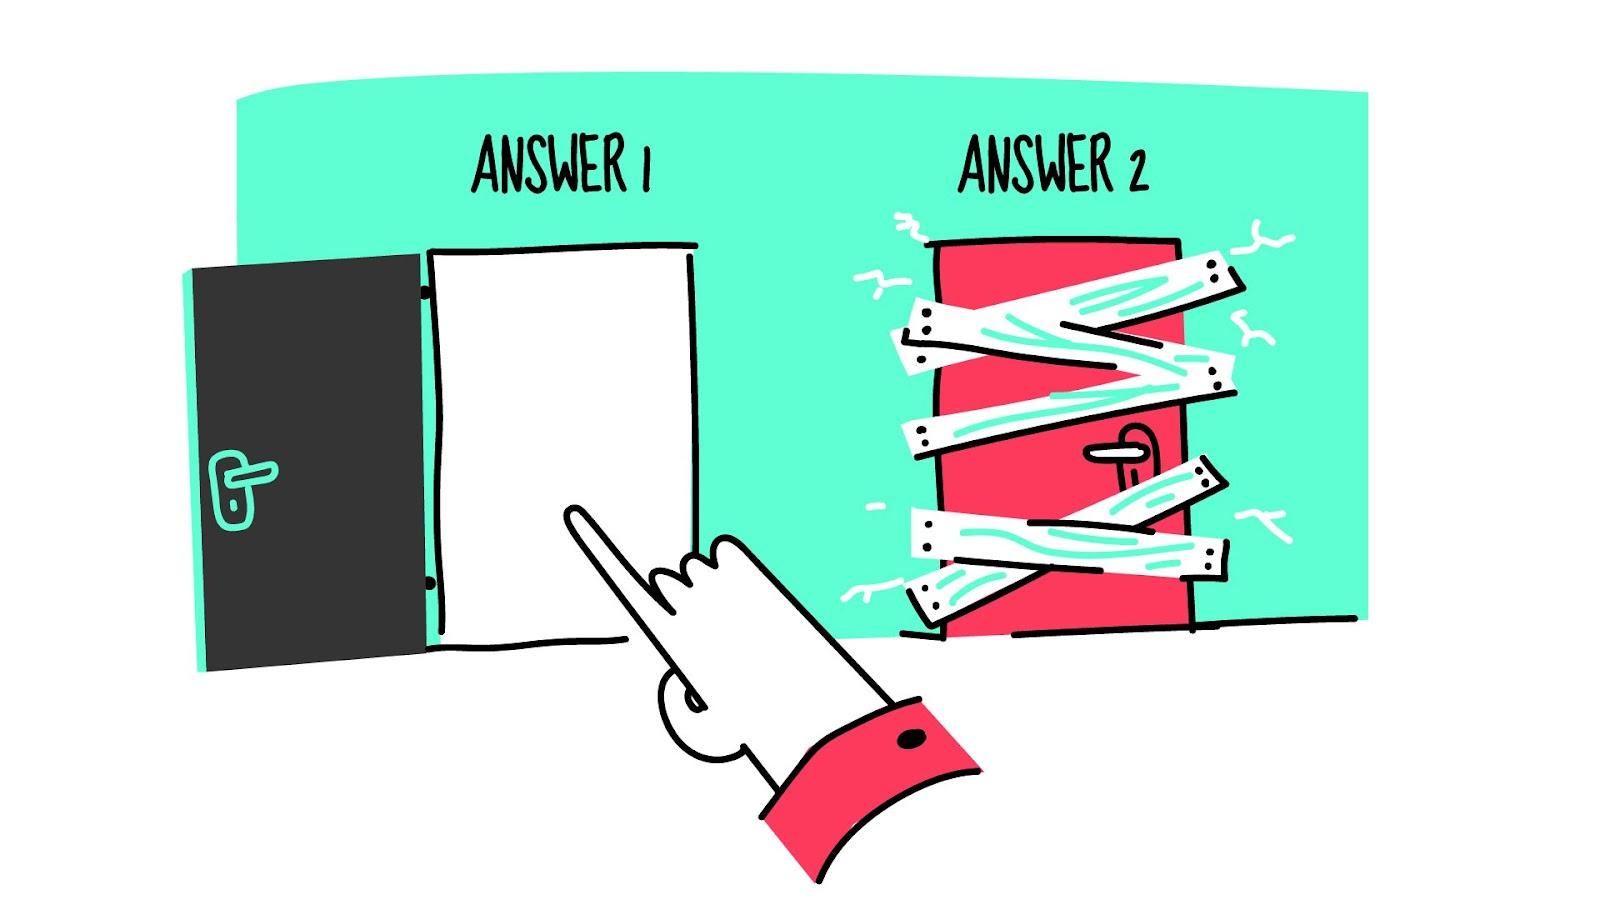 Don't ask leading survey questions